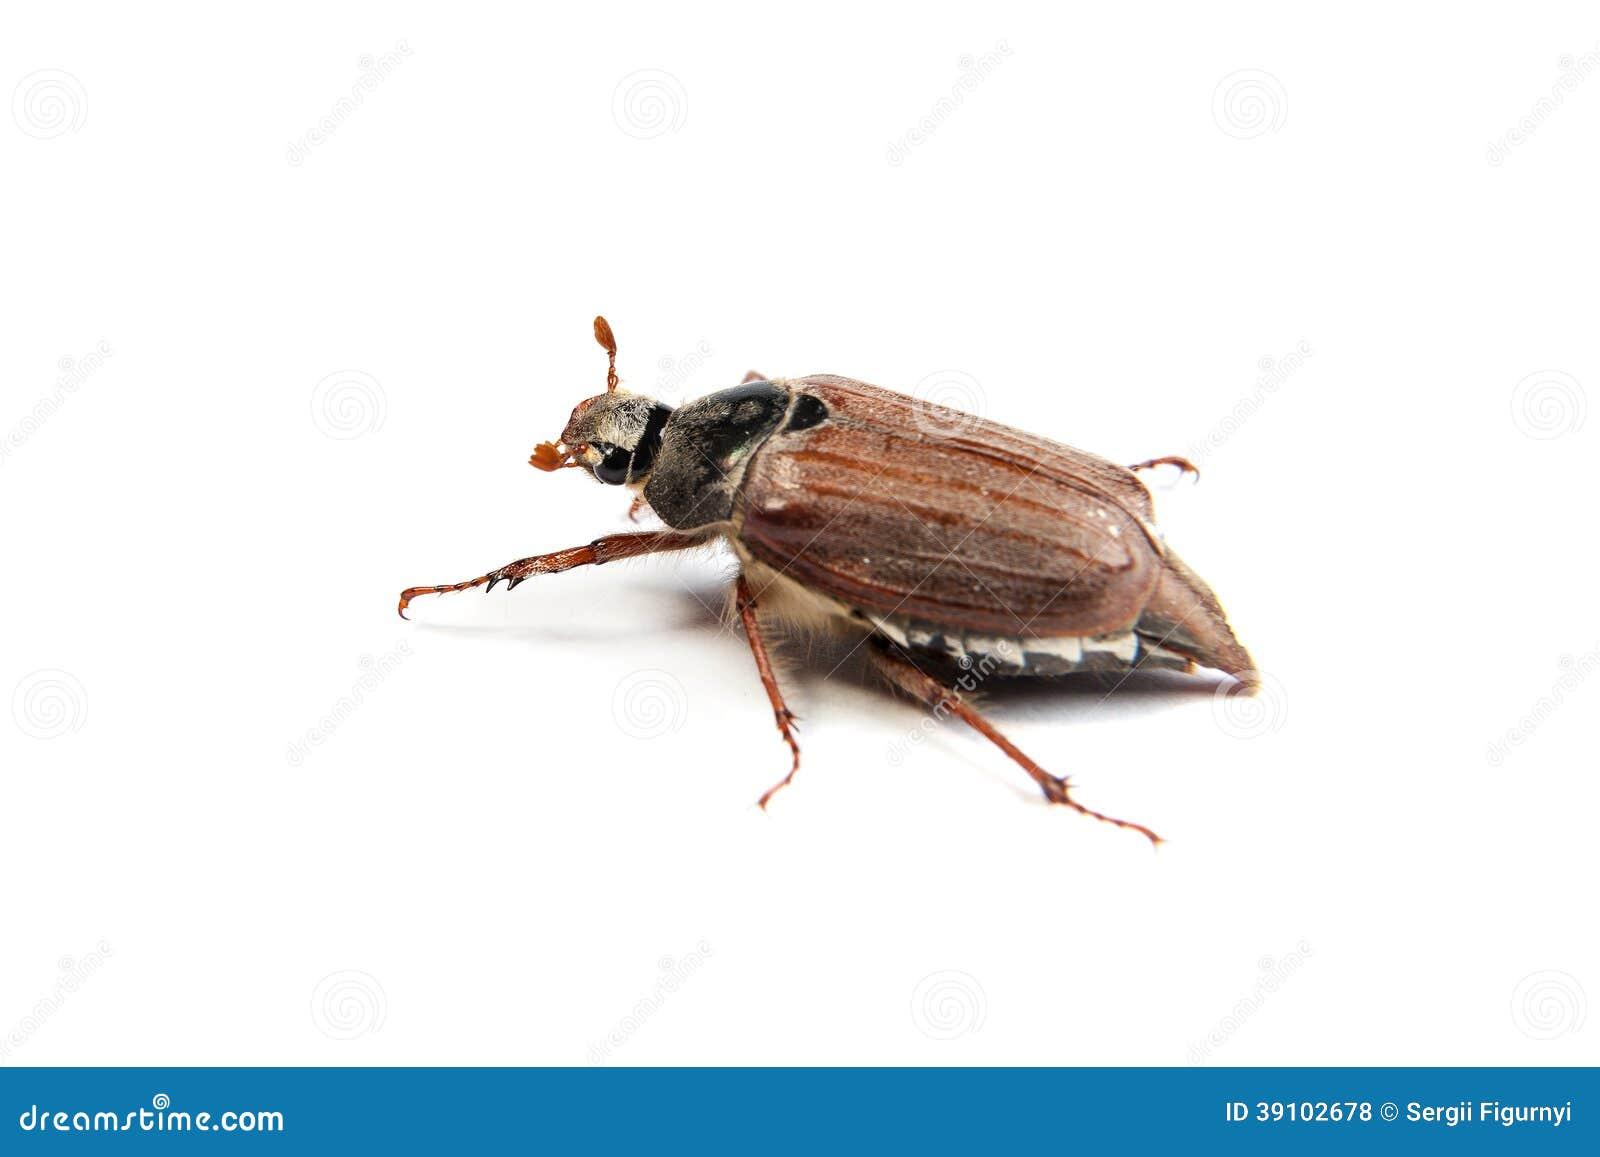 Mei-insectenmacro op wit wordt geïsoleerd dat.